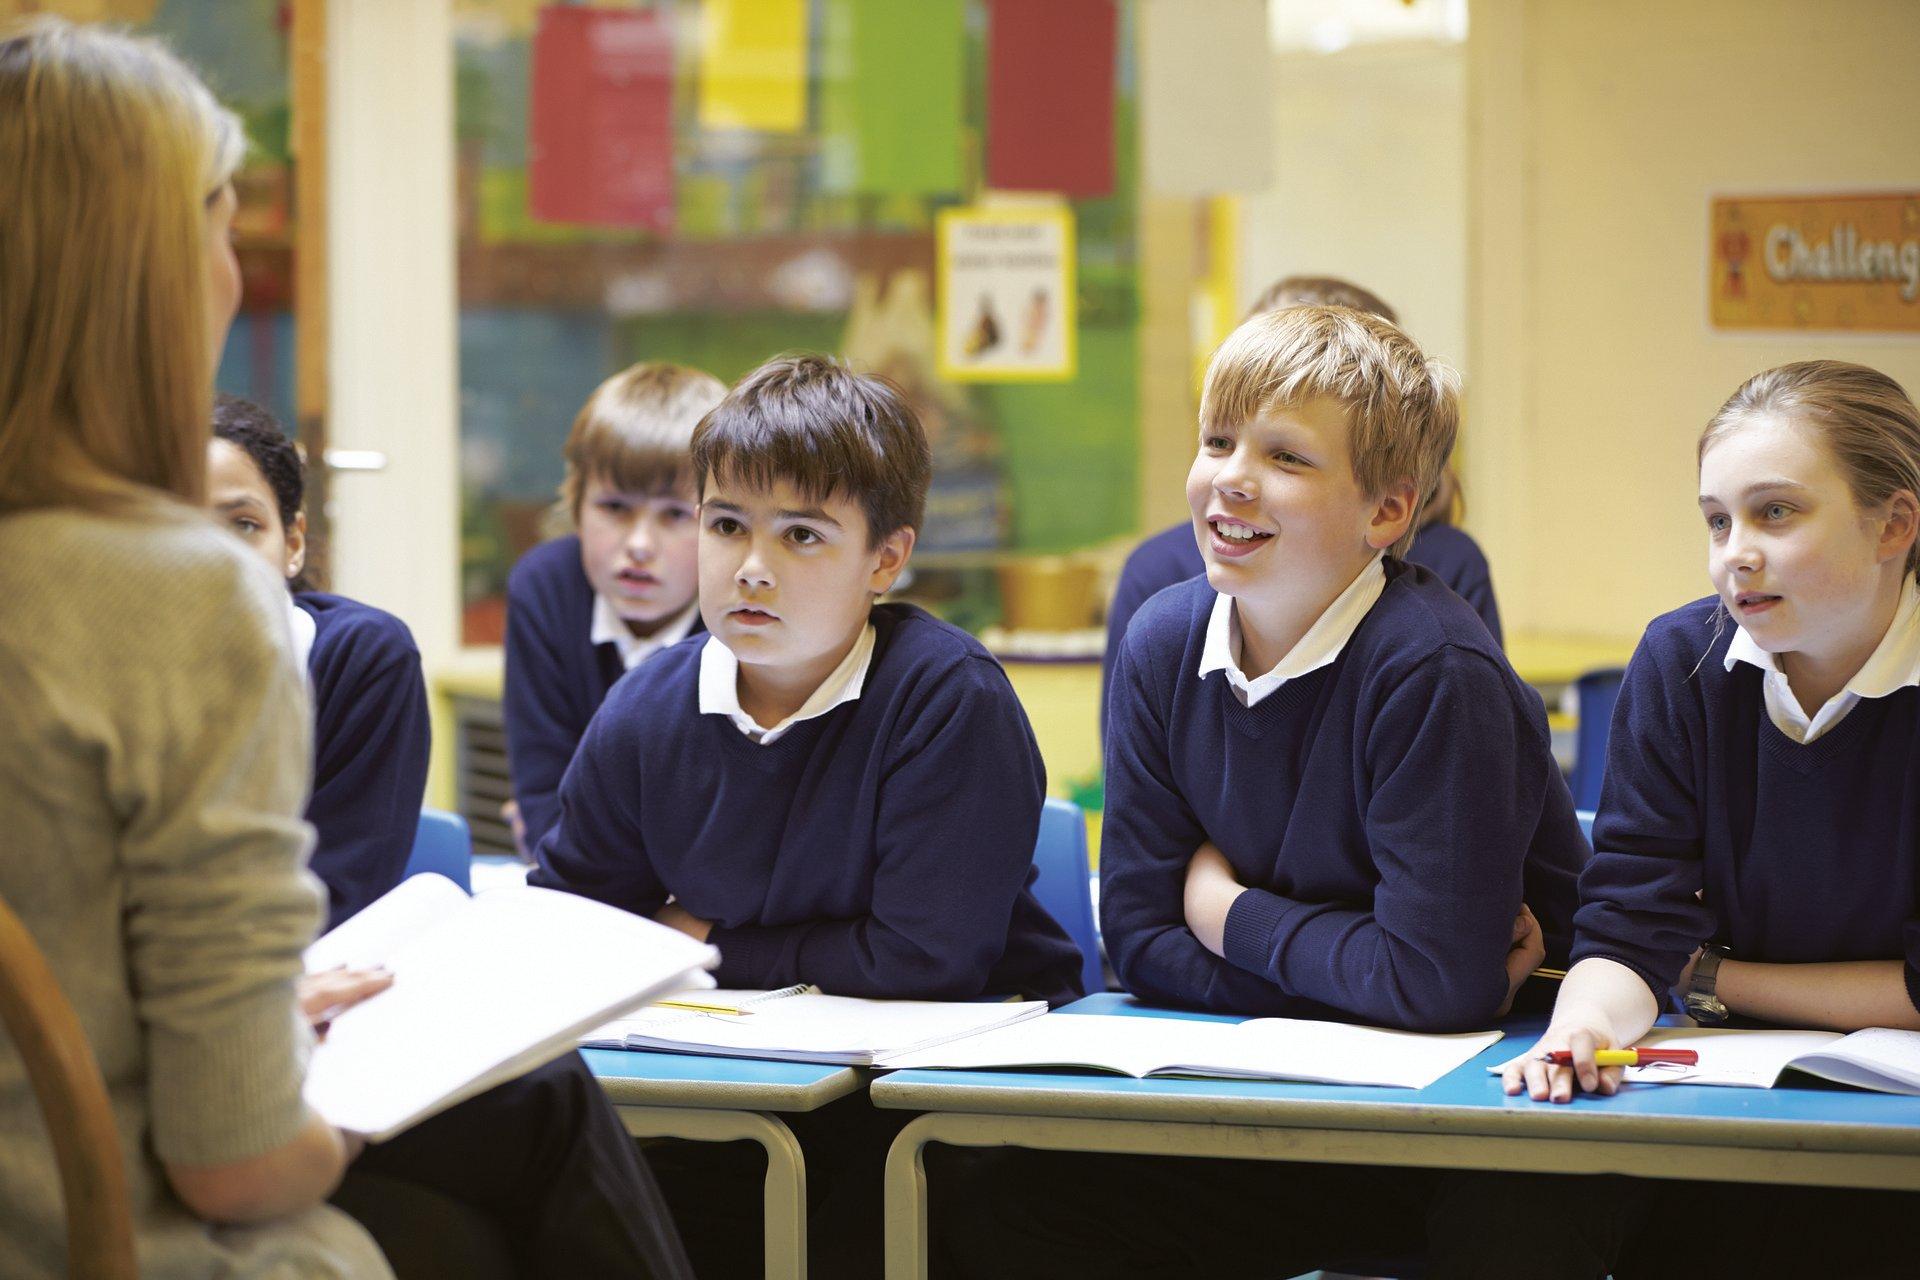 School children in a classroom listening to their teacher read a book